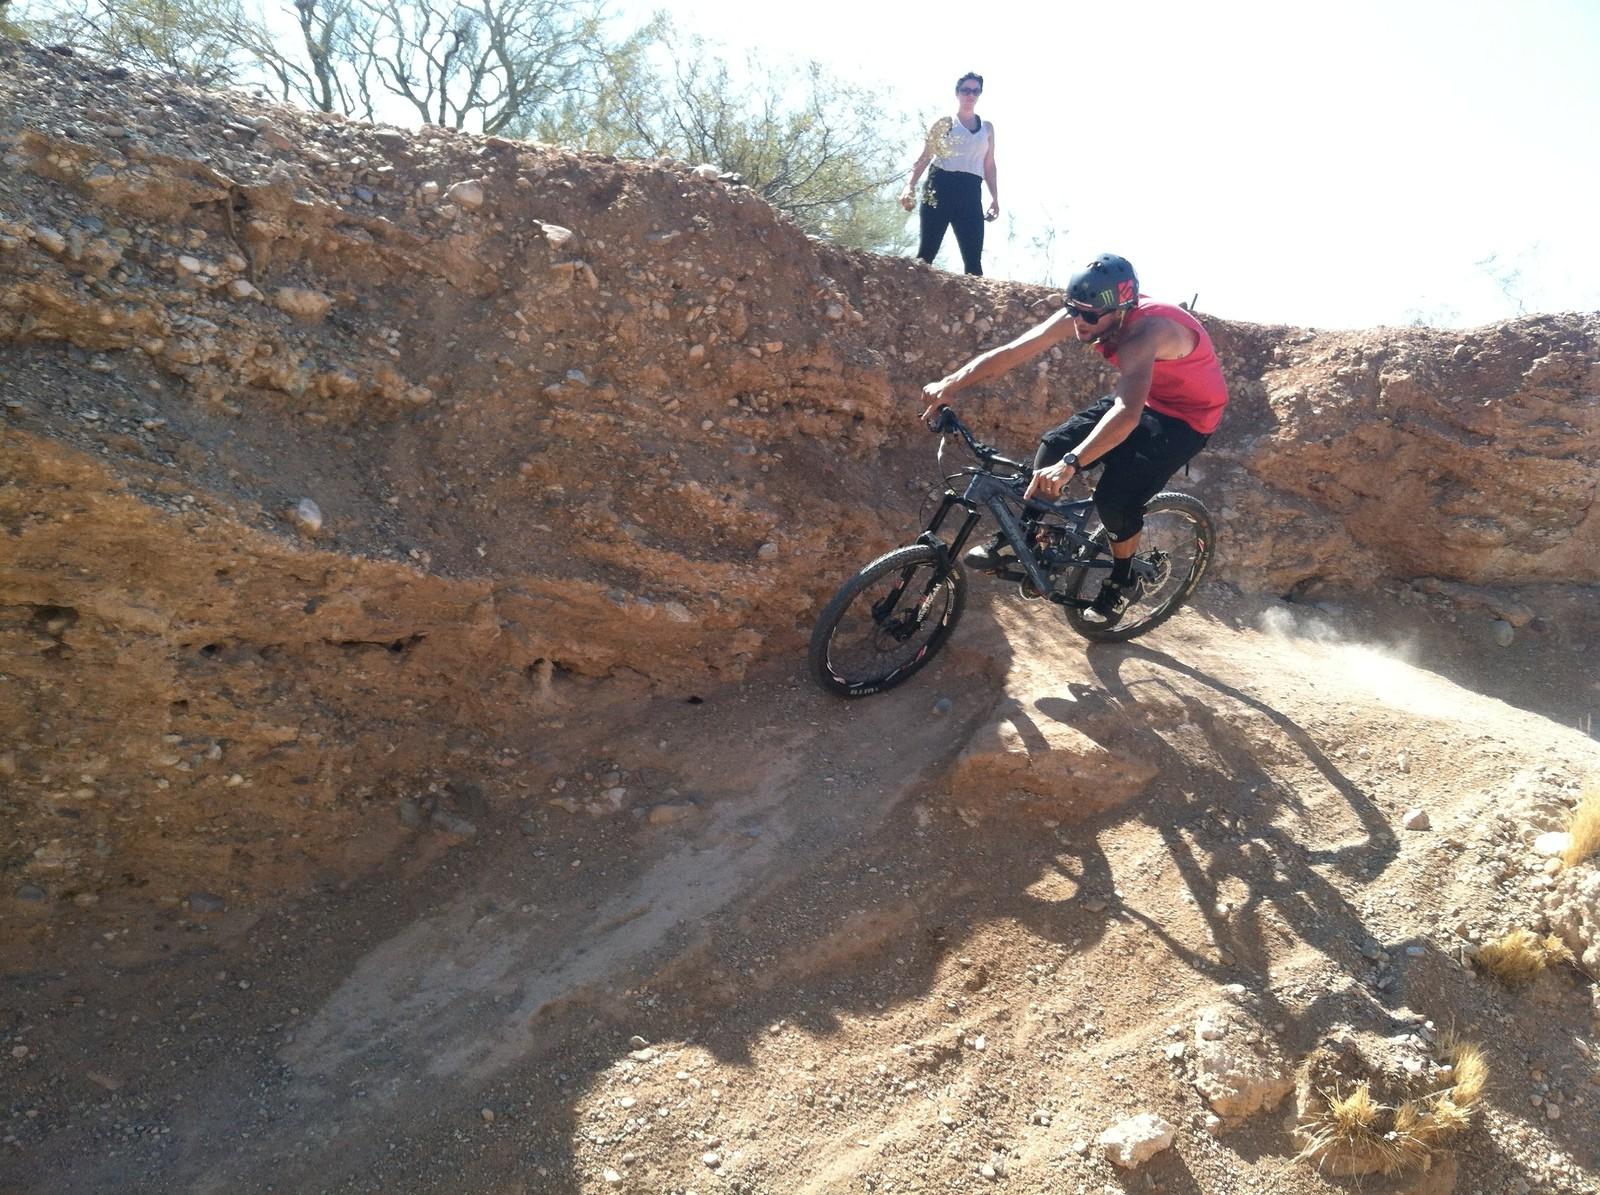 Bermin' - JordanJoker10 - Mountain Biking Pictures - Vital MTB